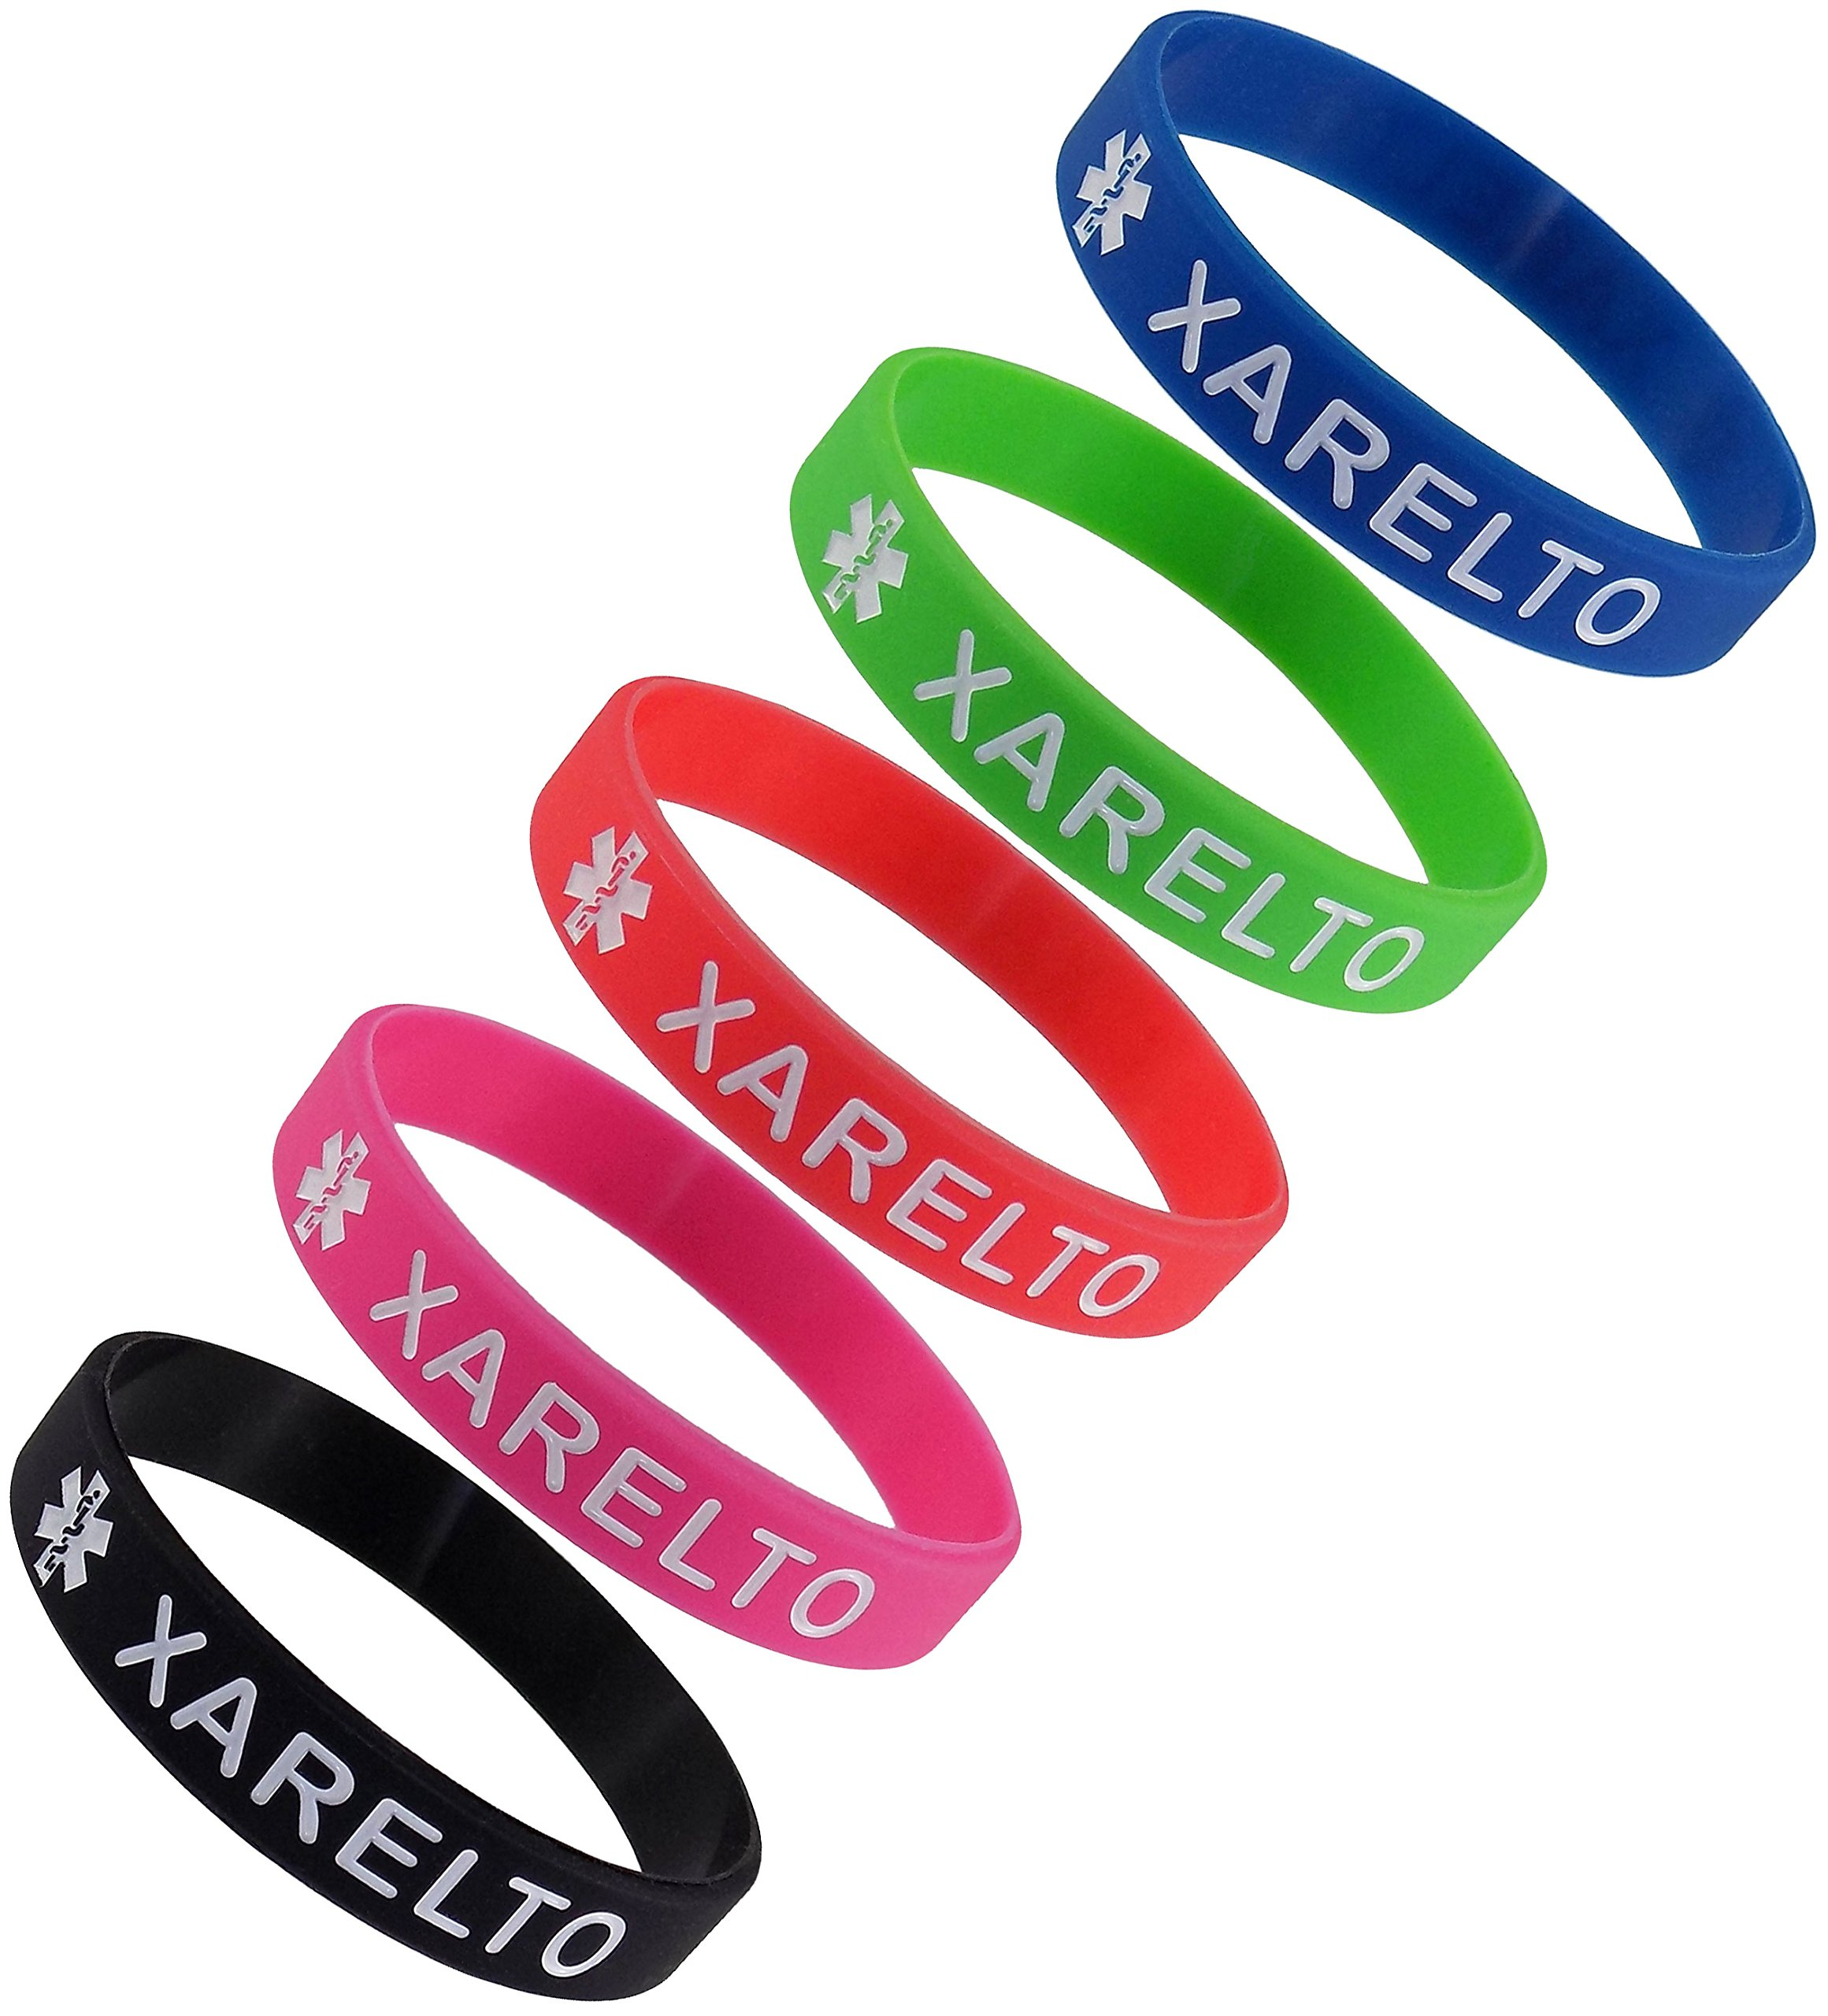 Max Petals 5 Pack - XARELTO Silicone Bracelet Wristbands